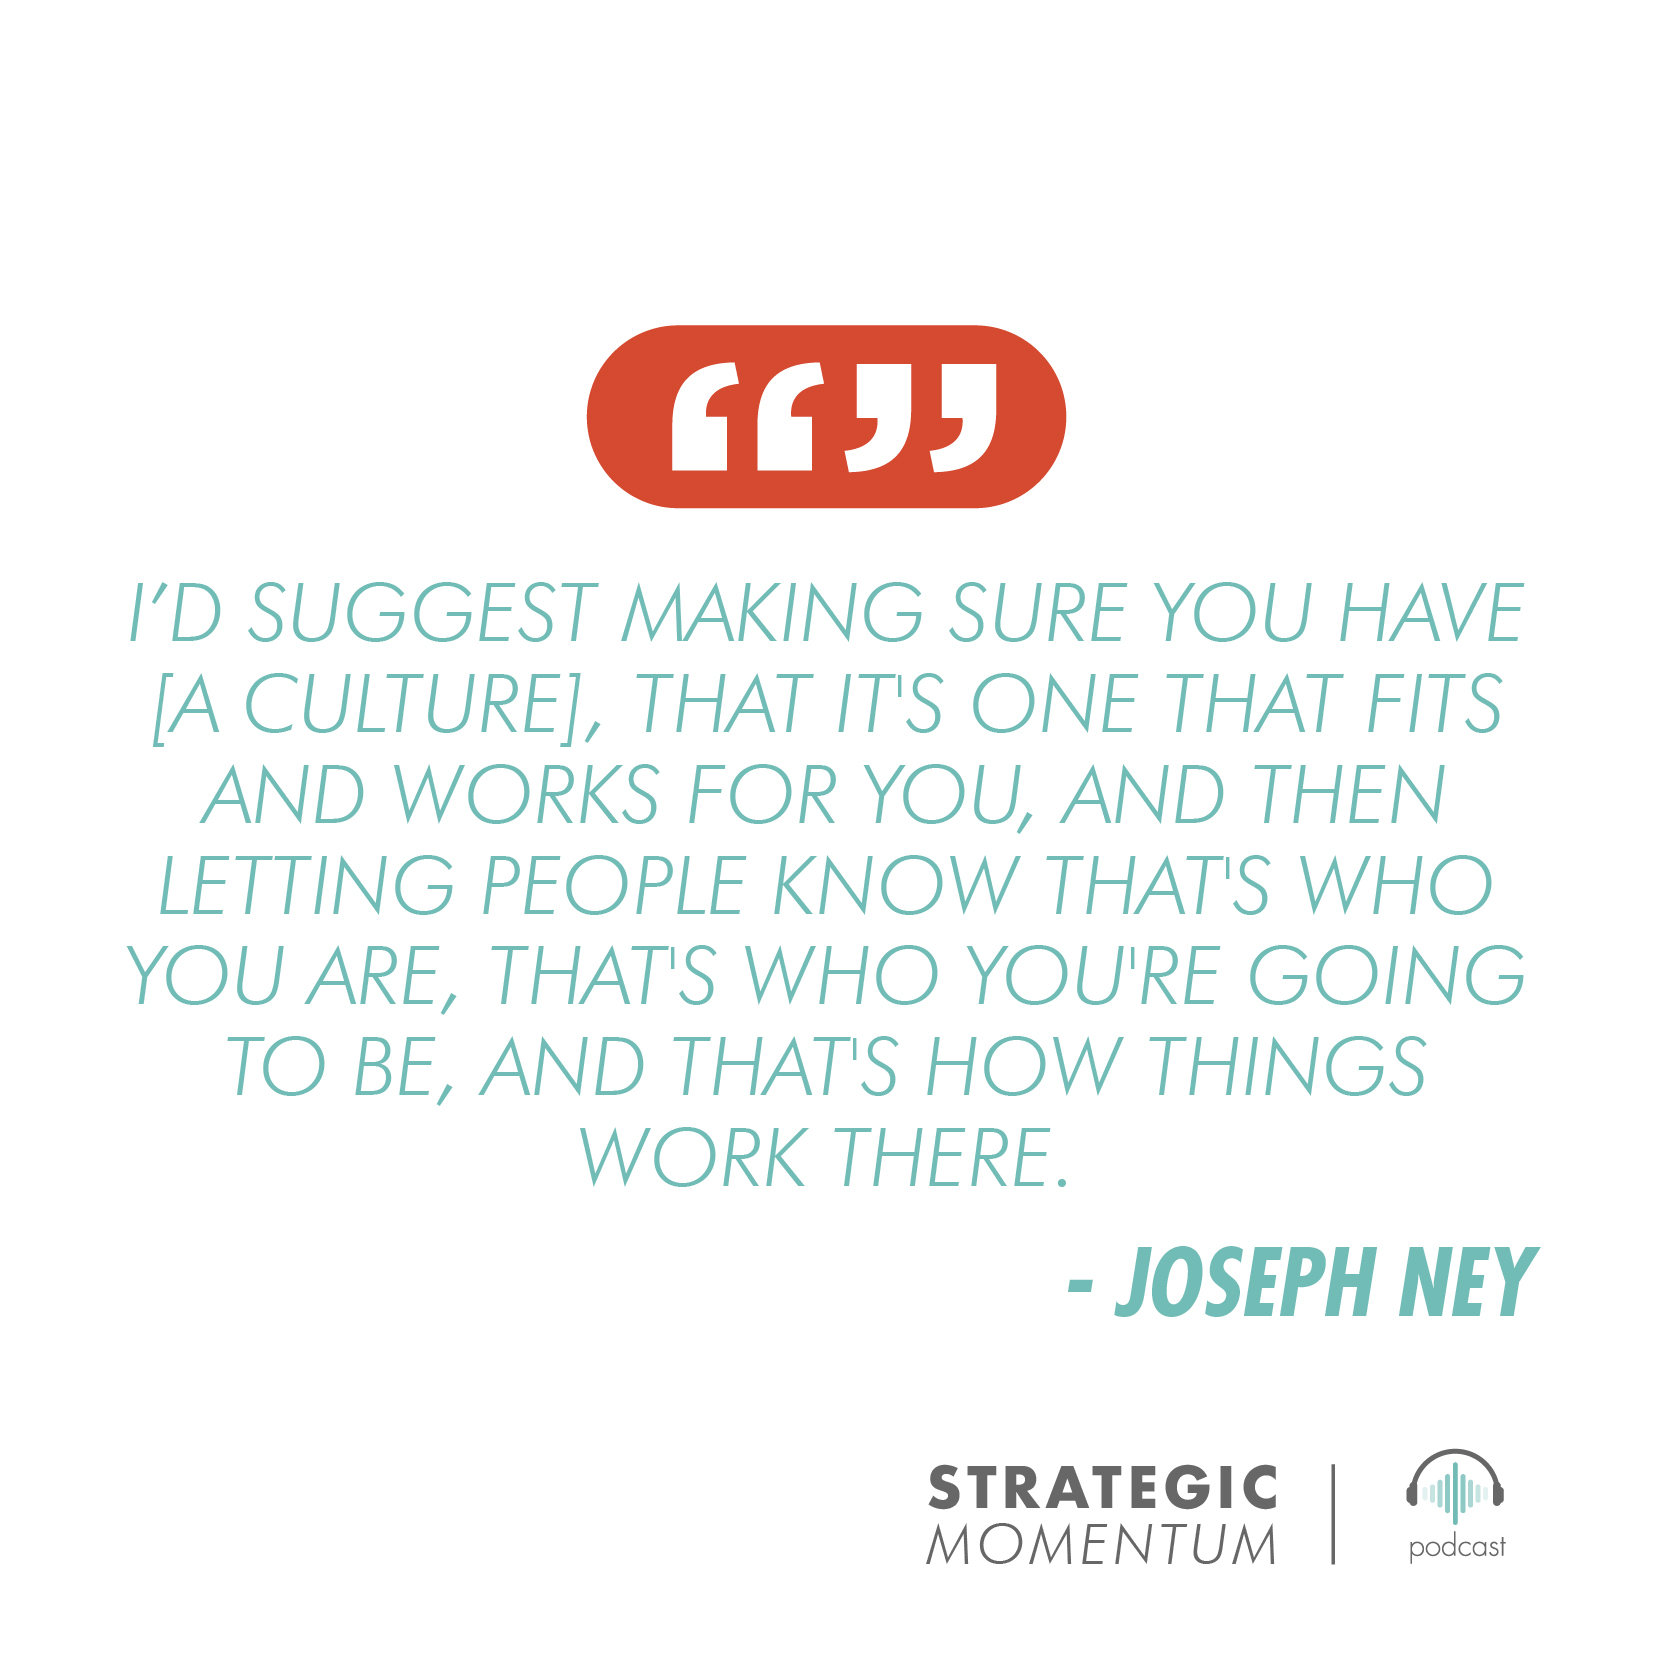 Joseph Ney Quote | Strategic Momentum Podcast